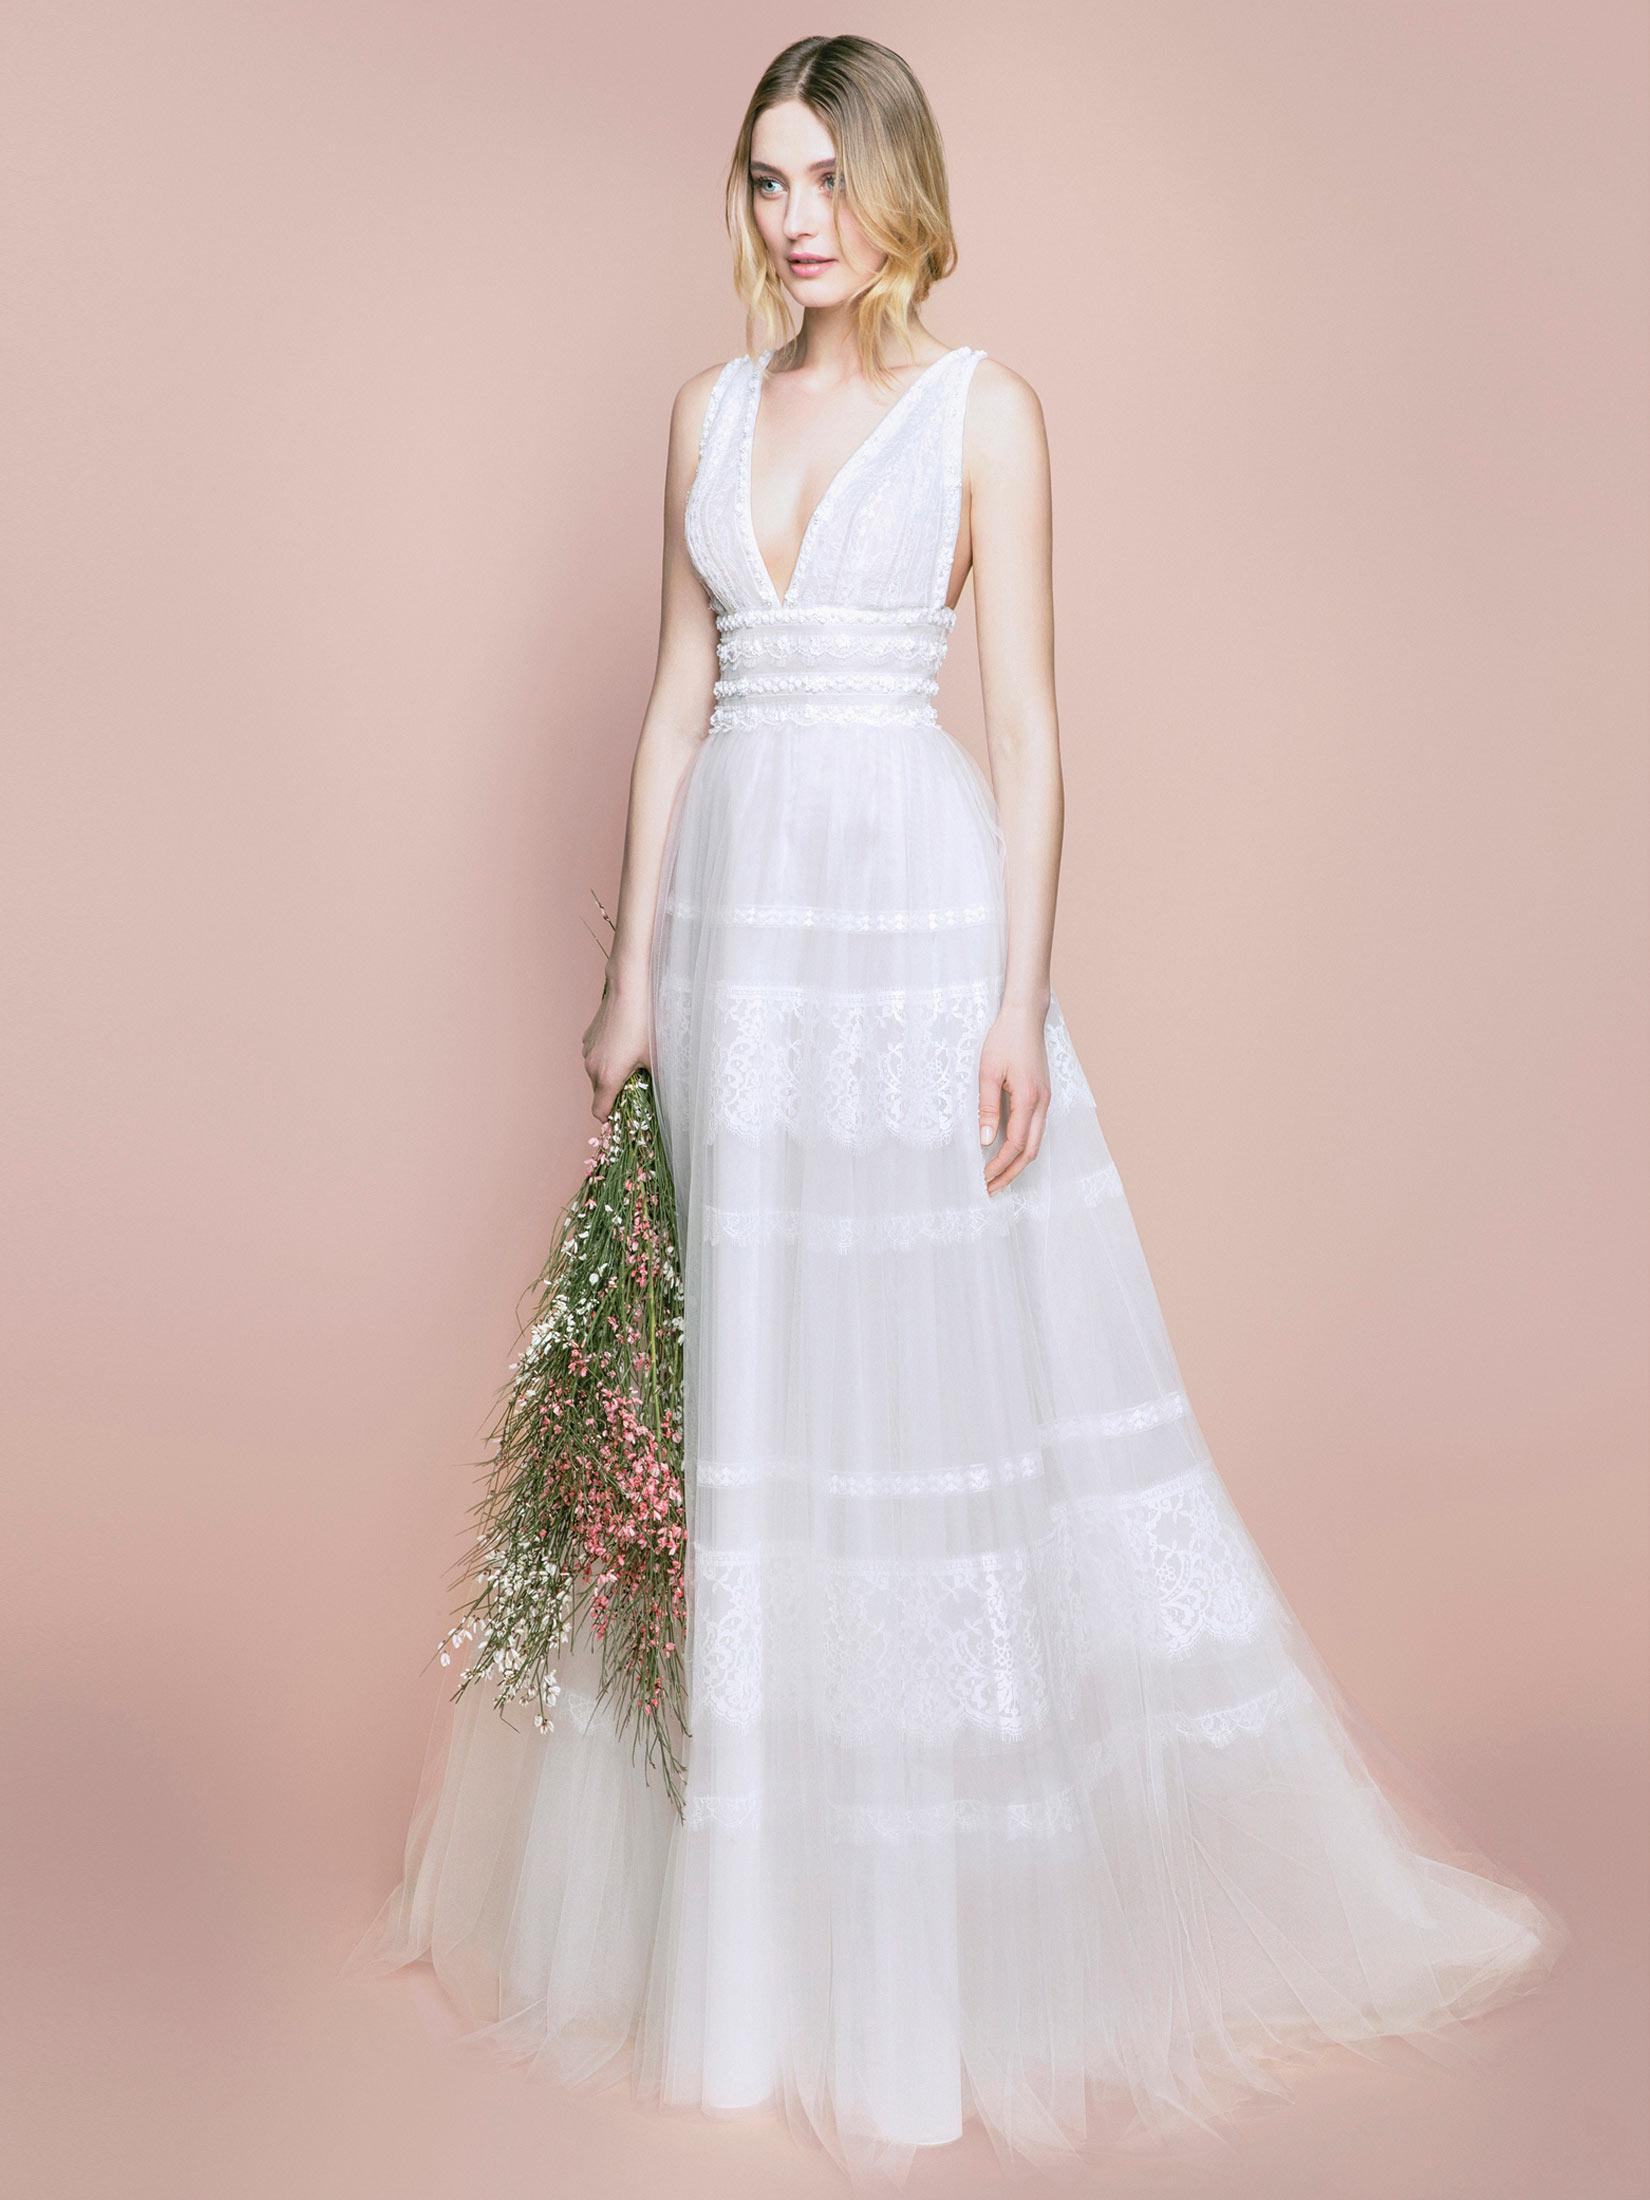 reputable site 9680e 1c7ff Blumarine abiti da sposa